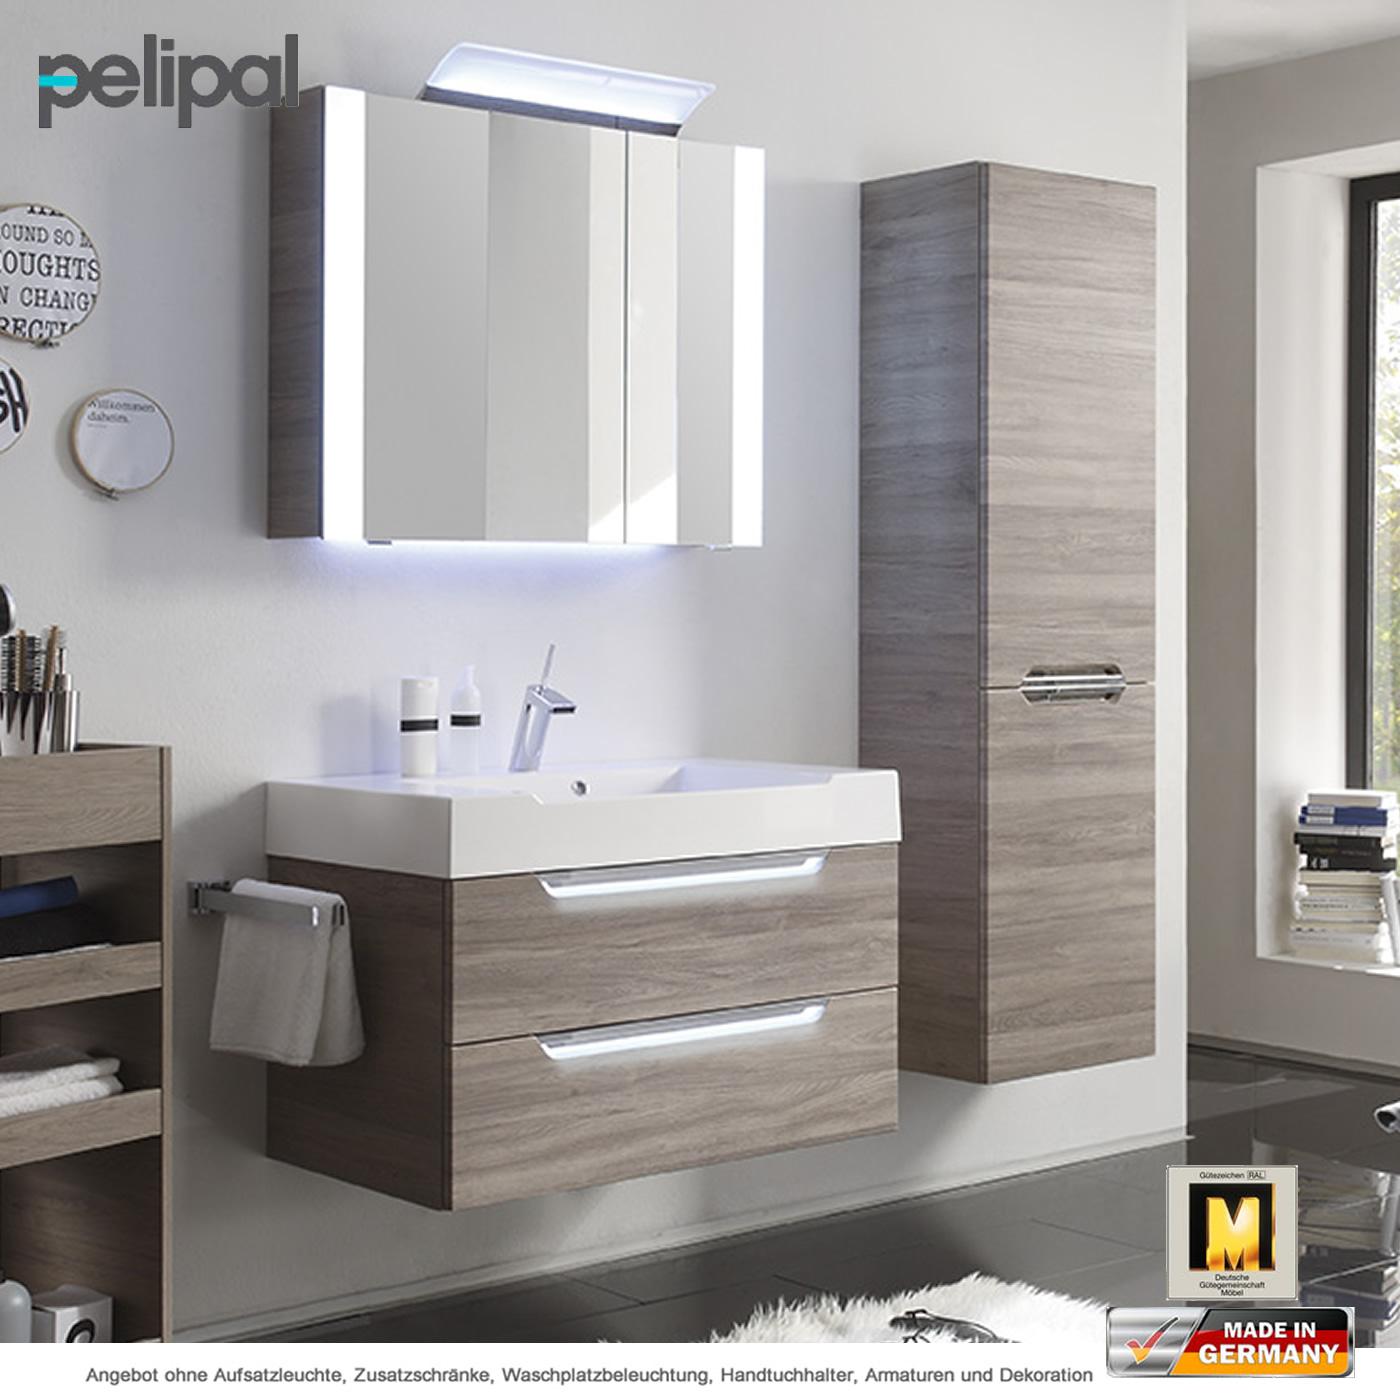 Pelipal badm bel als set solitaire 7020 v1 4 mit for Badmoebel set mit spiegelschrank